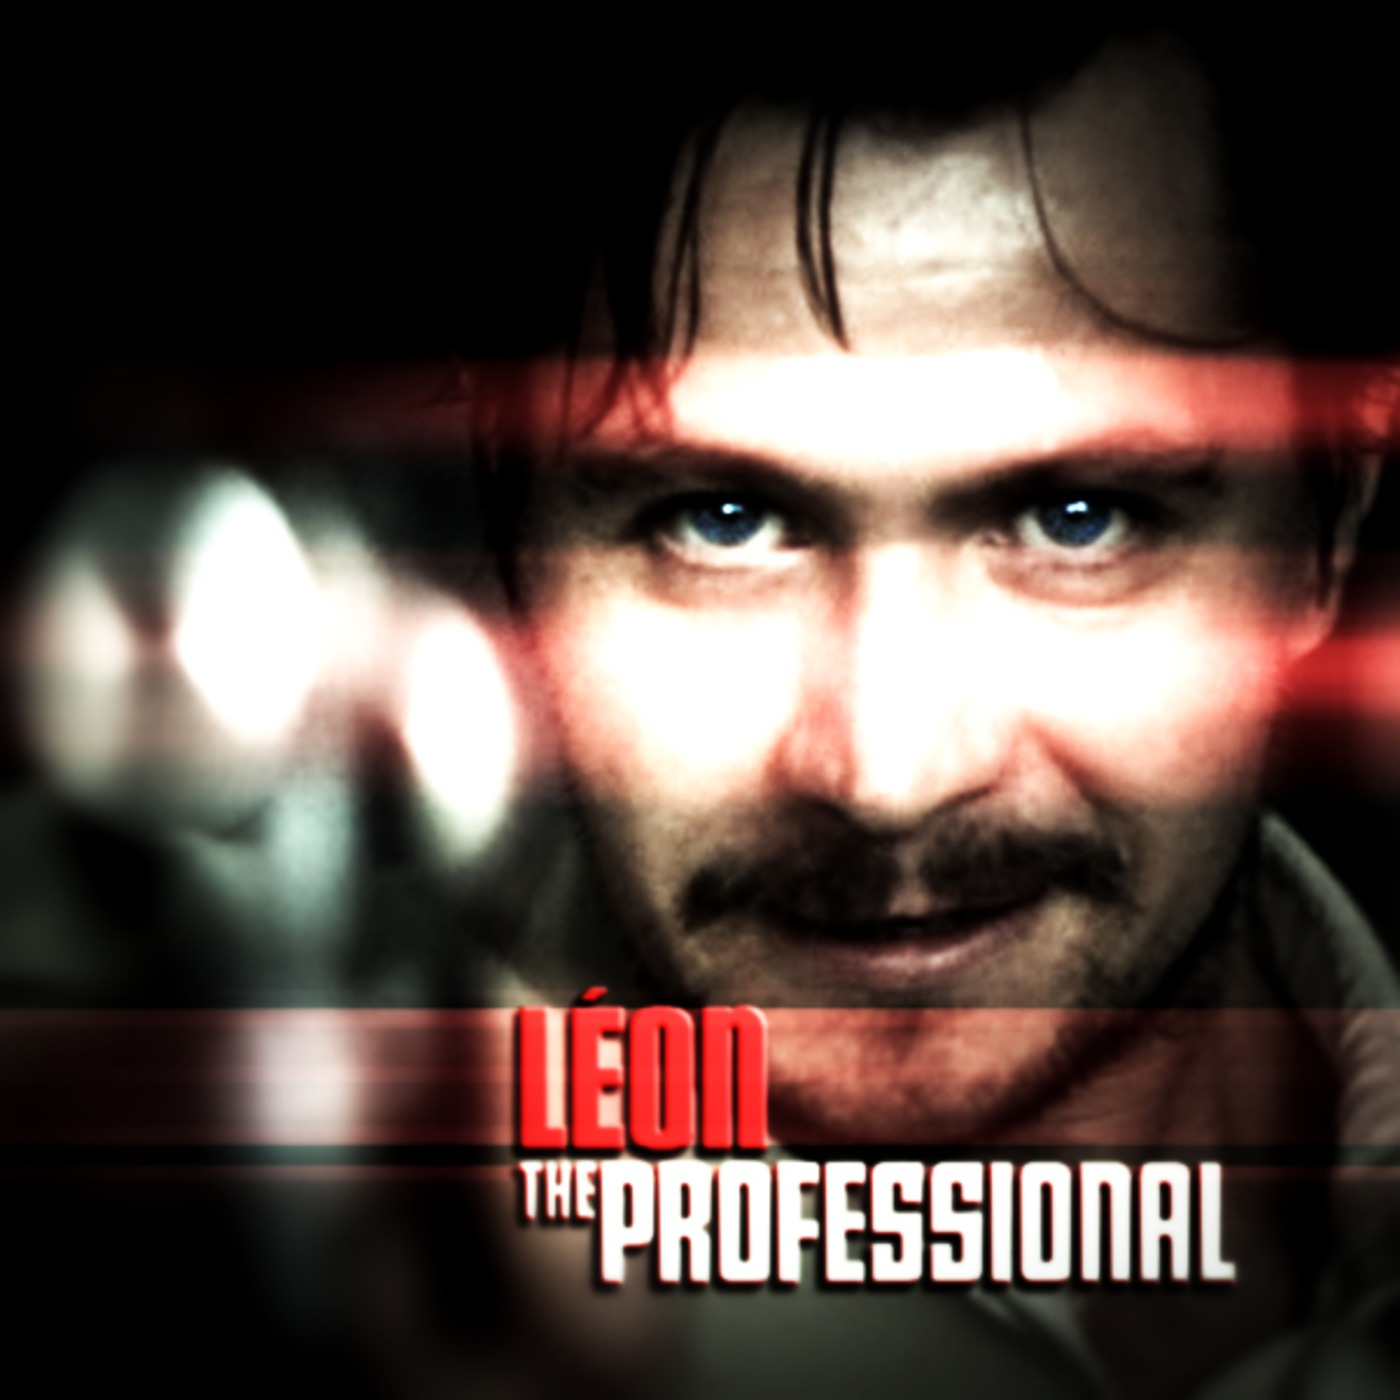 Episode 9: Spotlight Podcast - Leon: The Professional Film